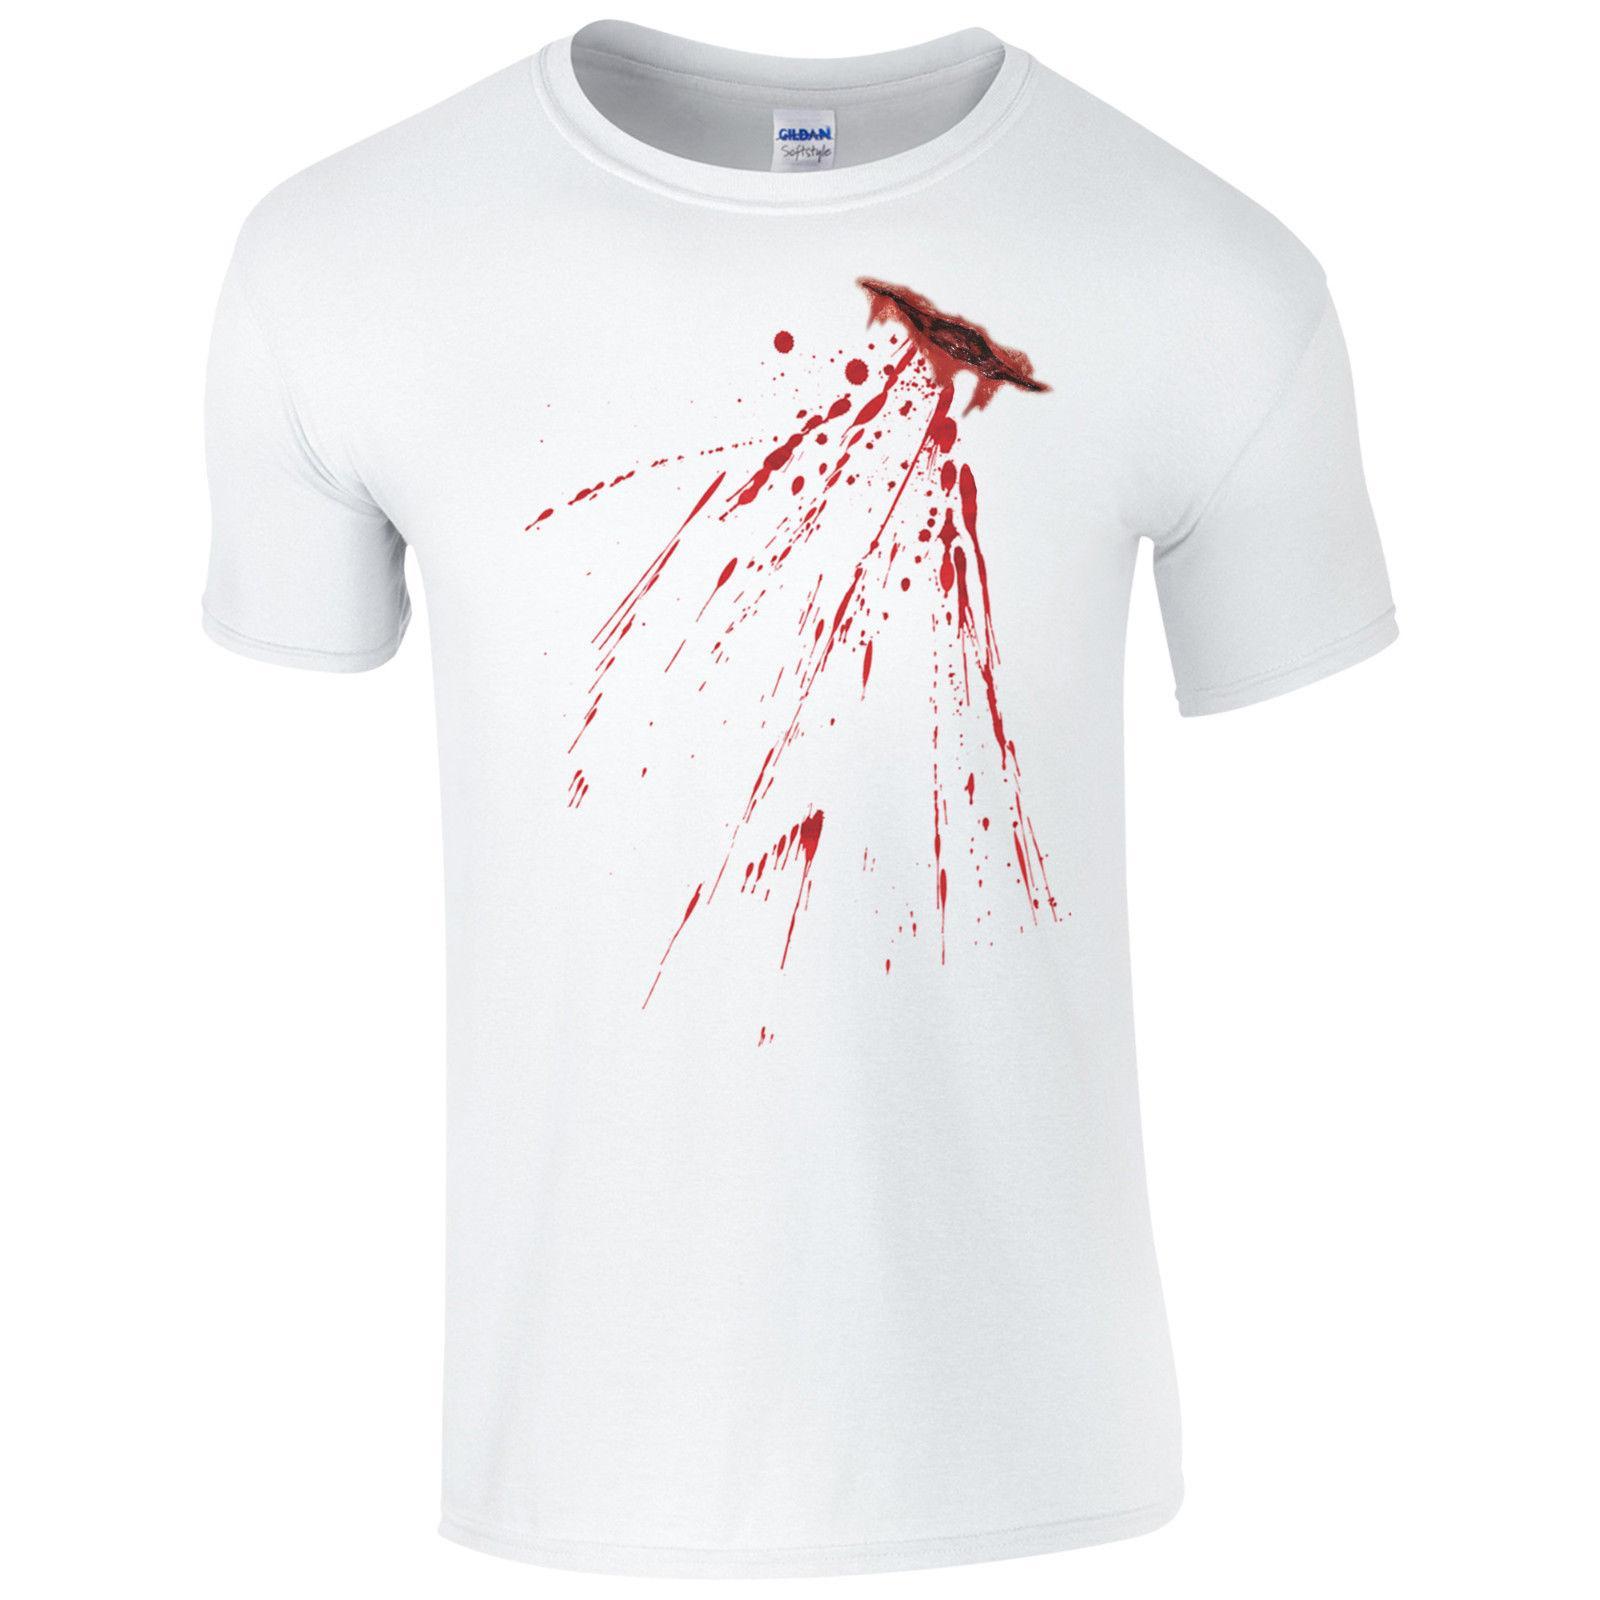 2066fd7d8 Fake Bloody Stab Wound T Shirt Halloween Knife Cut Stain Fancy Dress Mens  Top Custom Printed Tshirt, Hip Hop Funny Tee, Mens Tee Shirts T Shirts  Sites Shirt ...